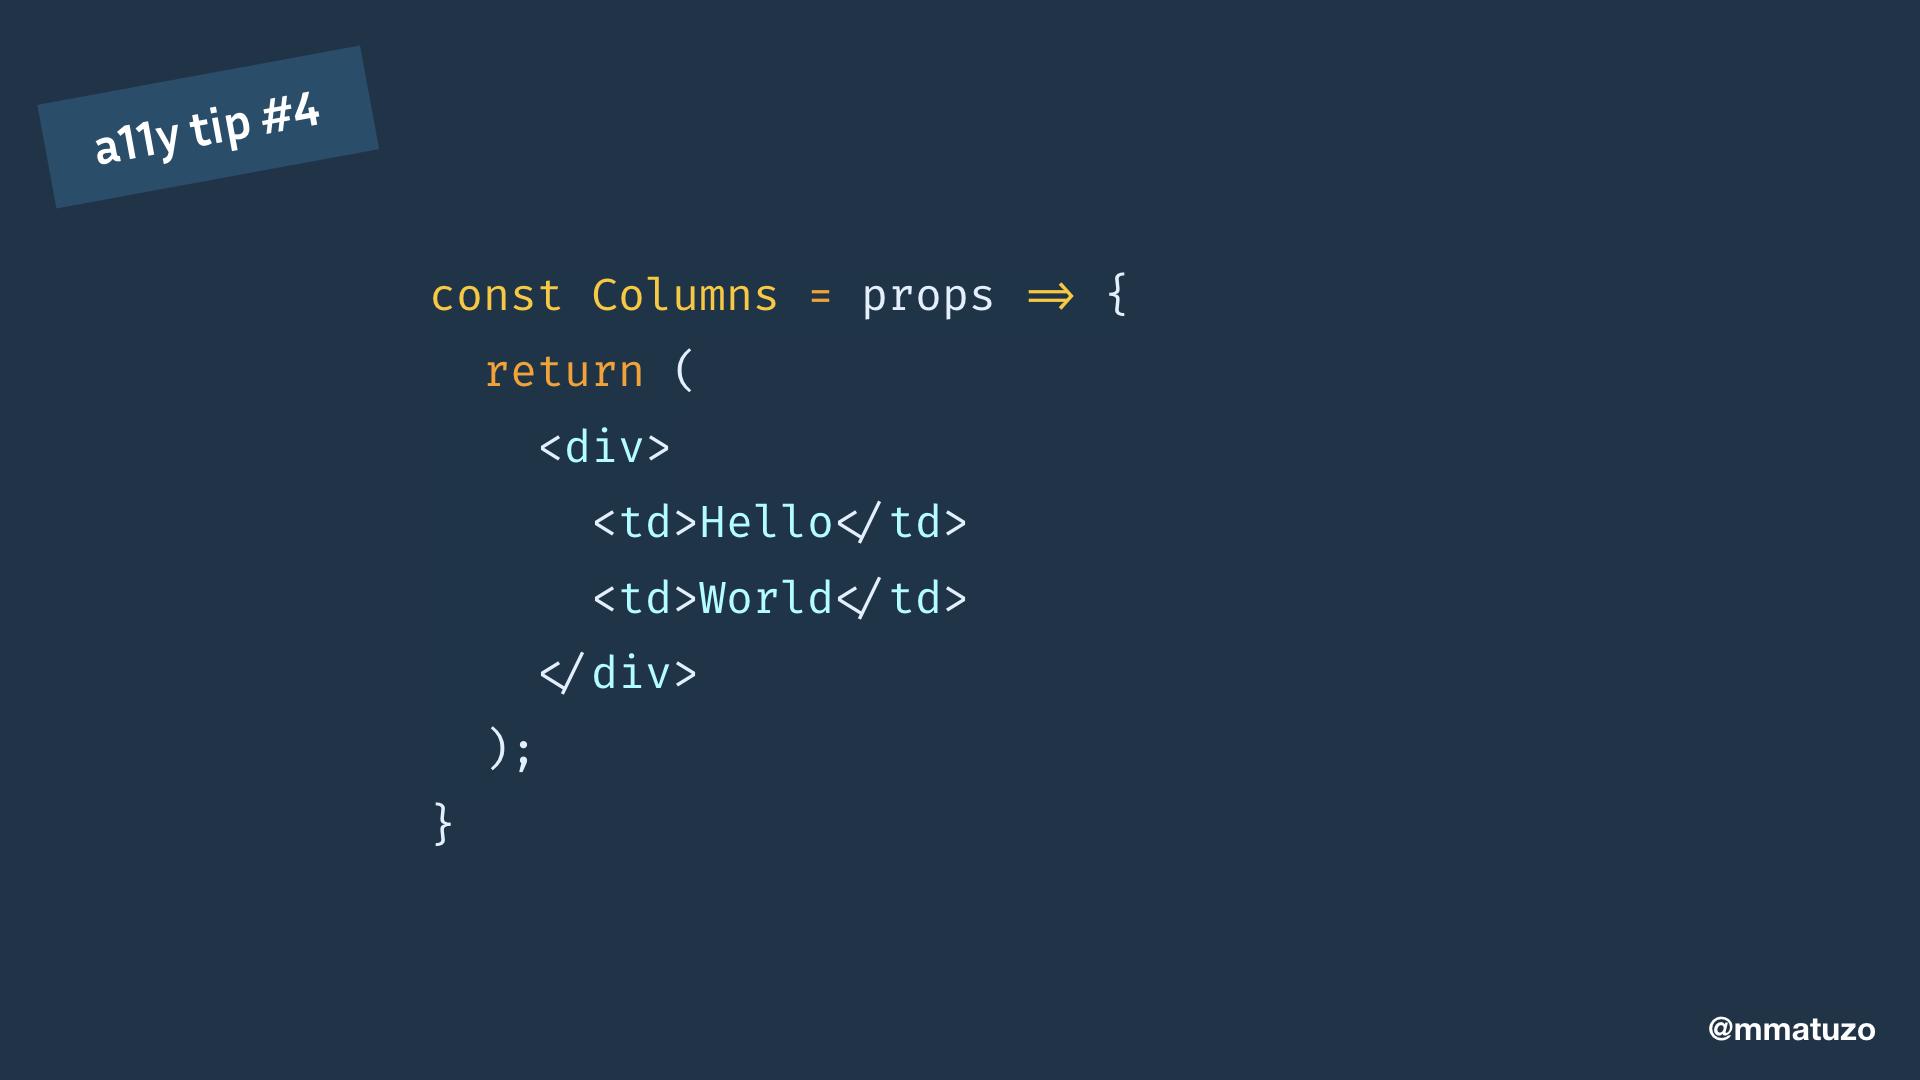 const Columns = props => { return (  Hello World  ); }